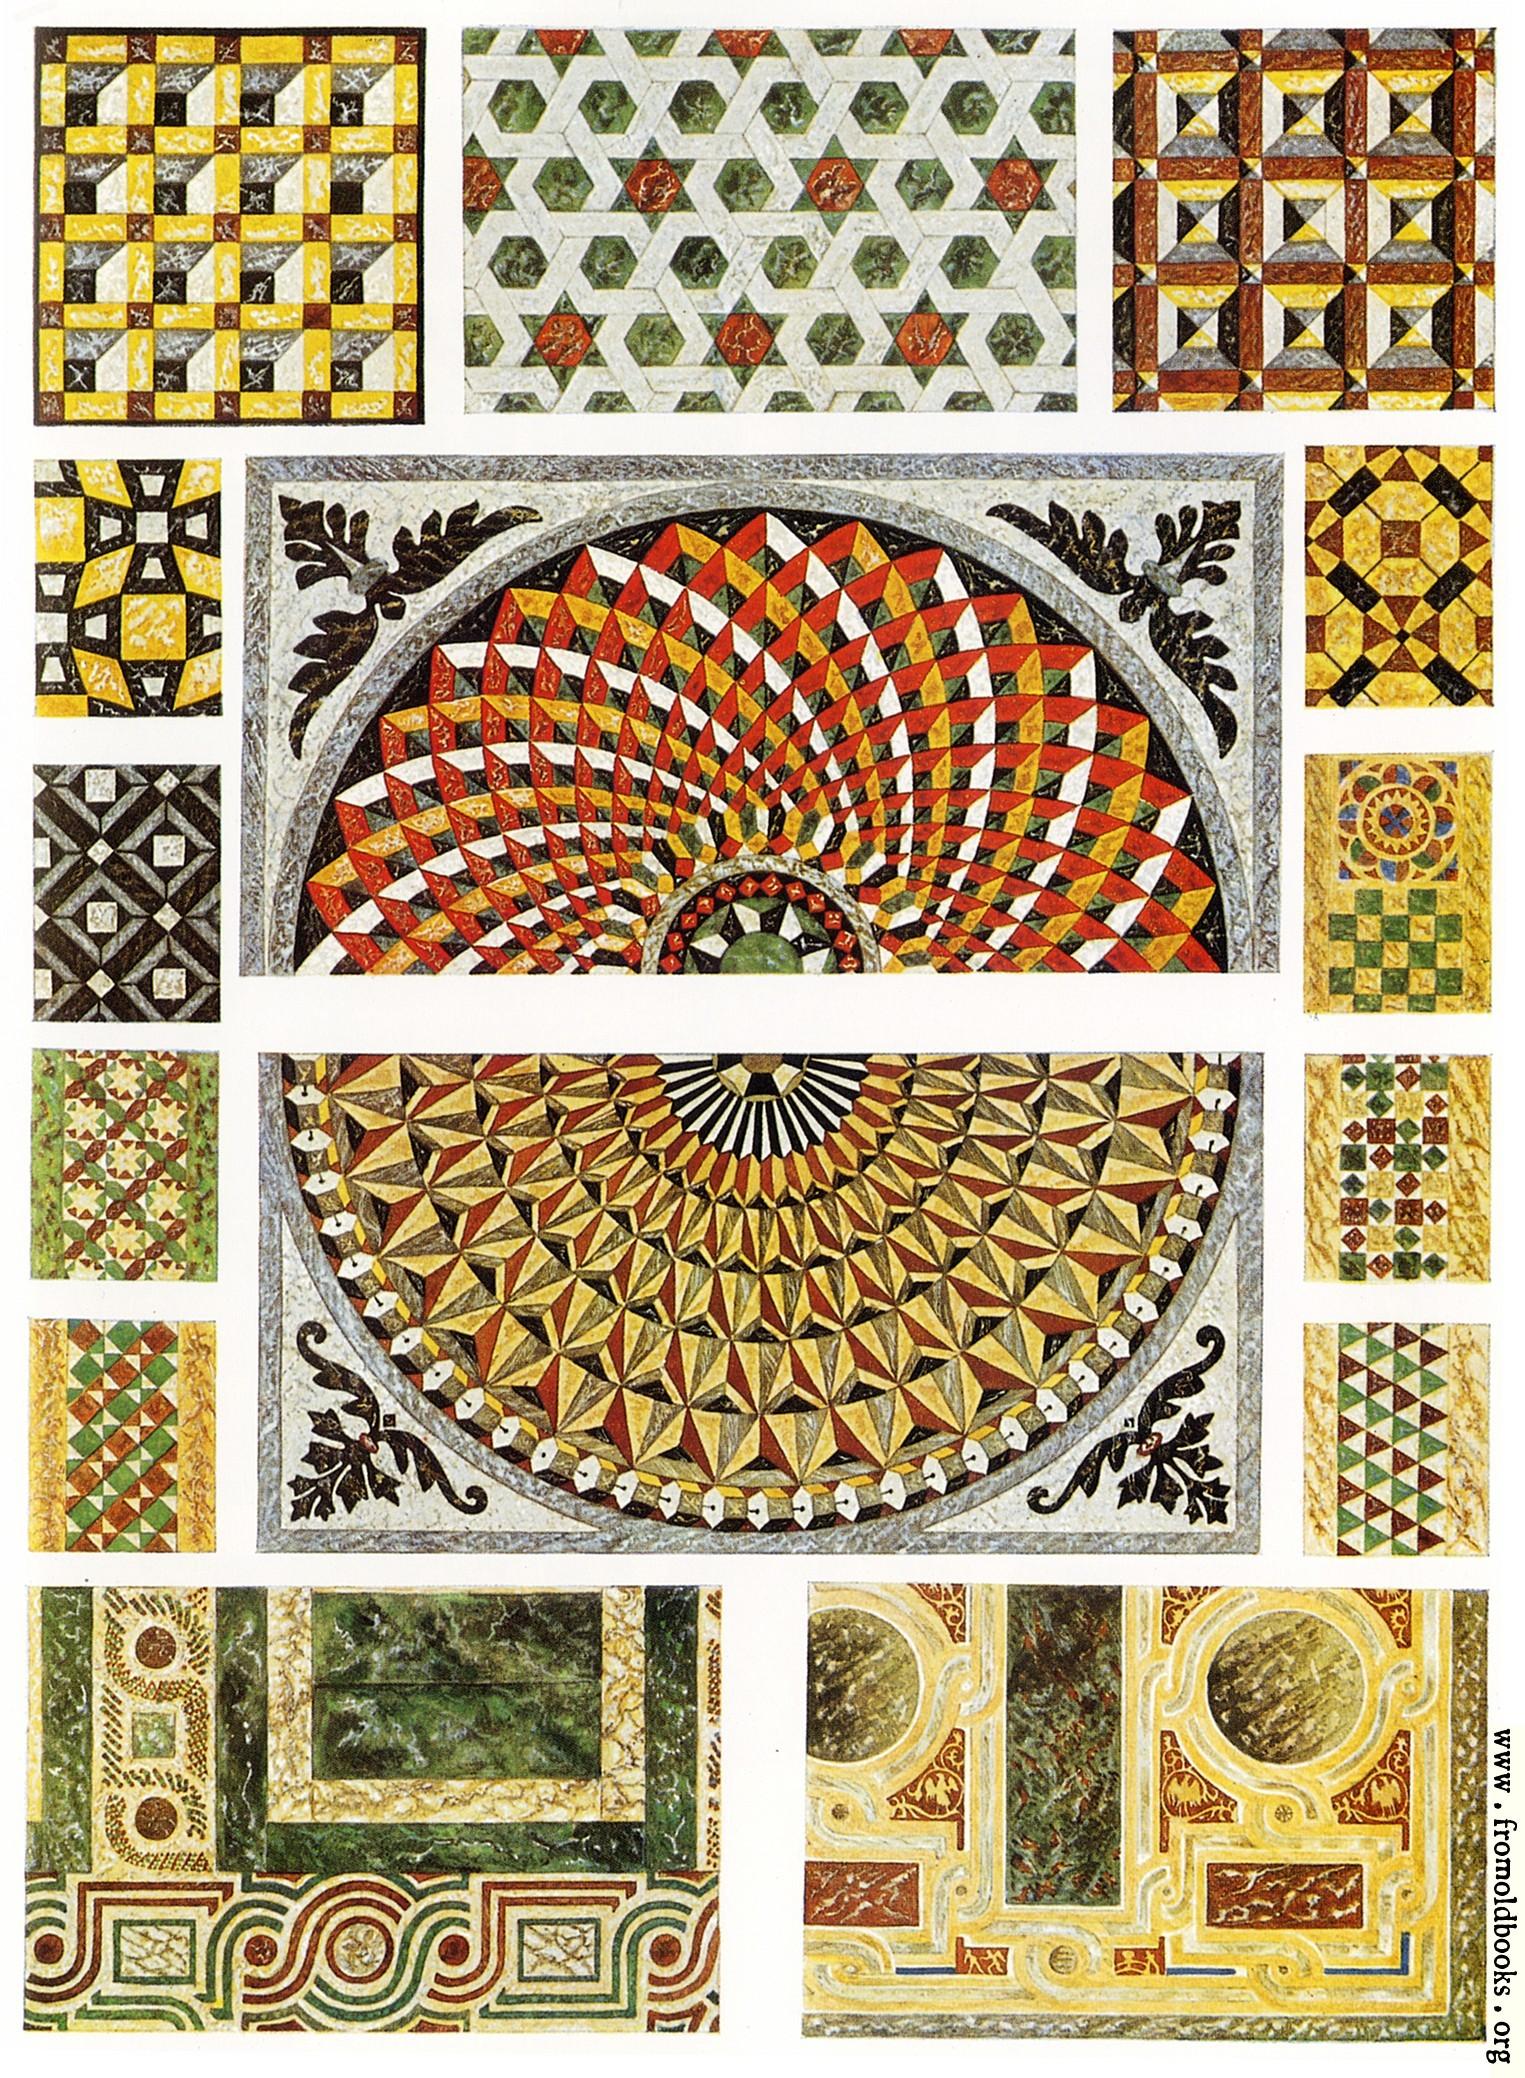 Byzantine Marble Floor Mosaics